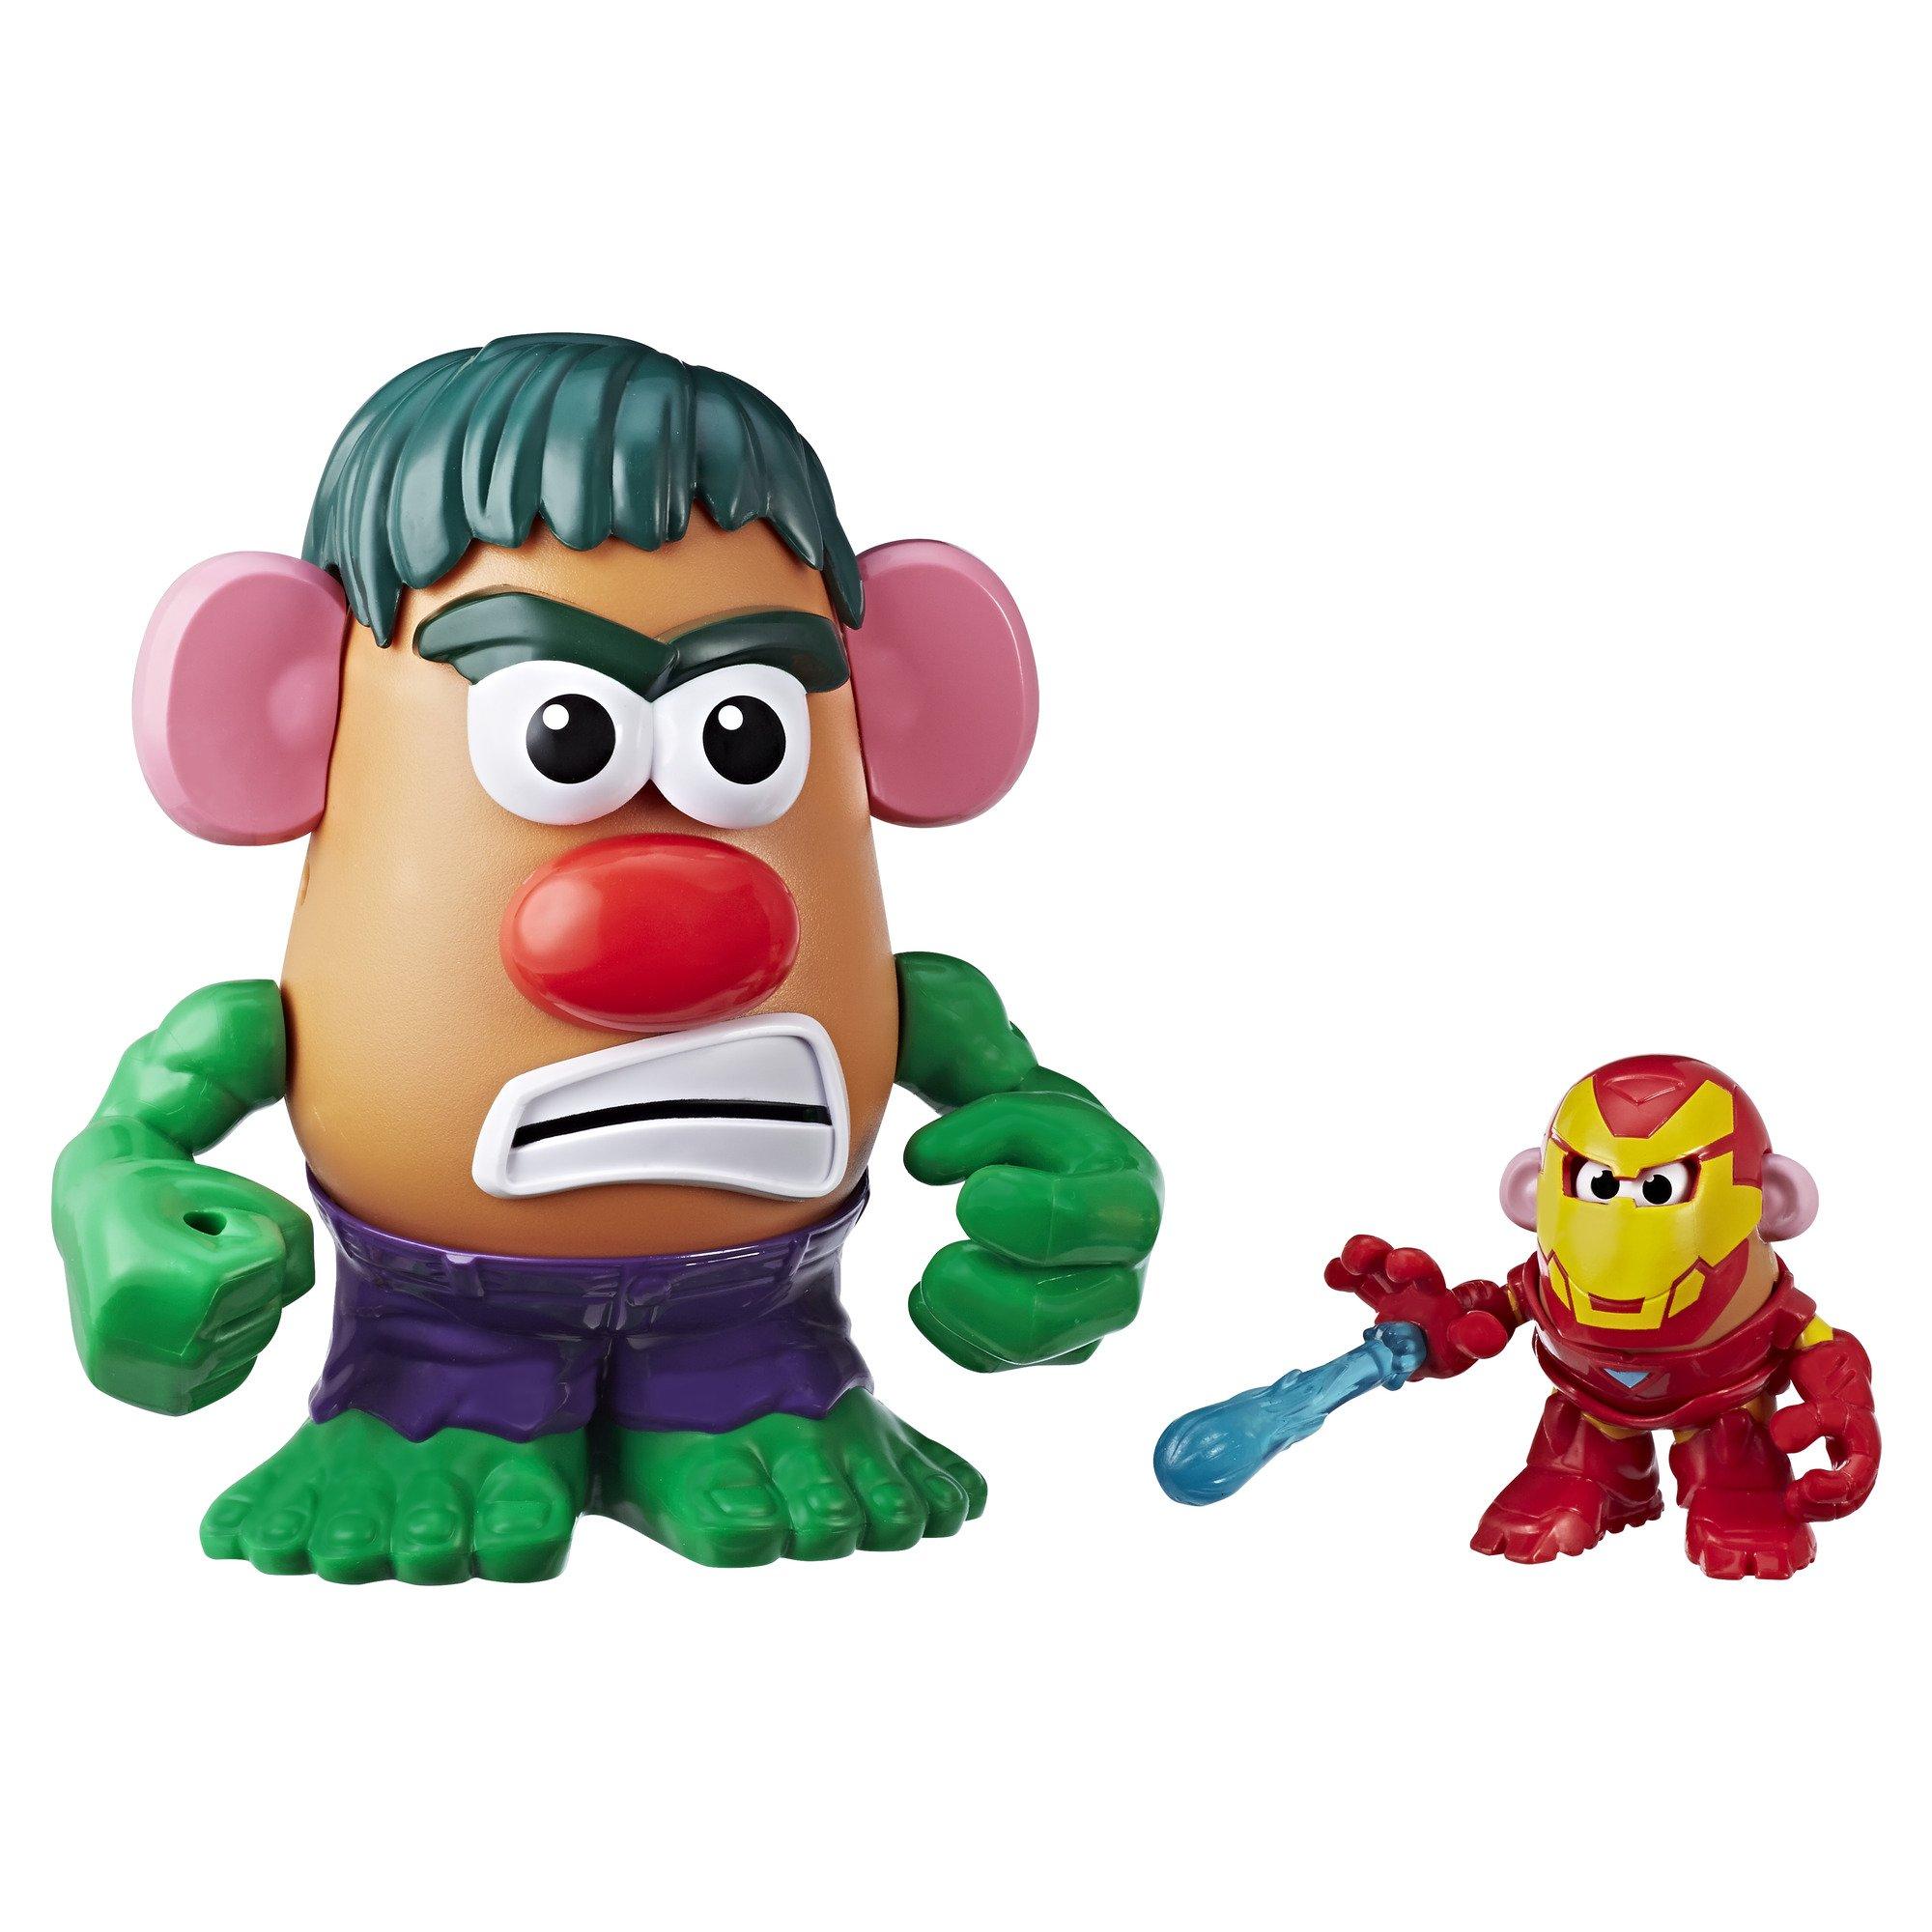 Green Hulk Mr Potato Head